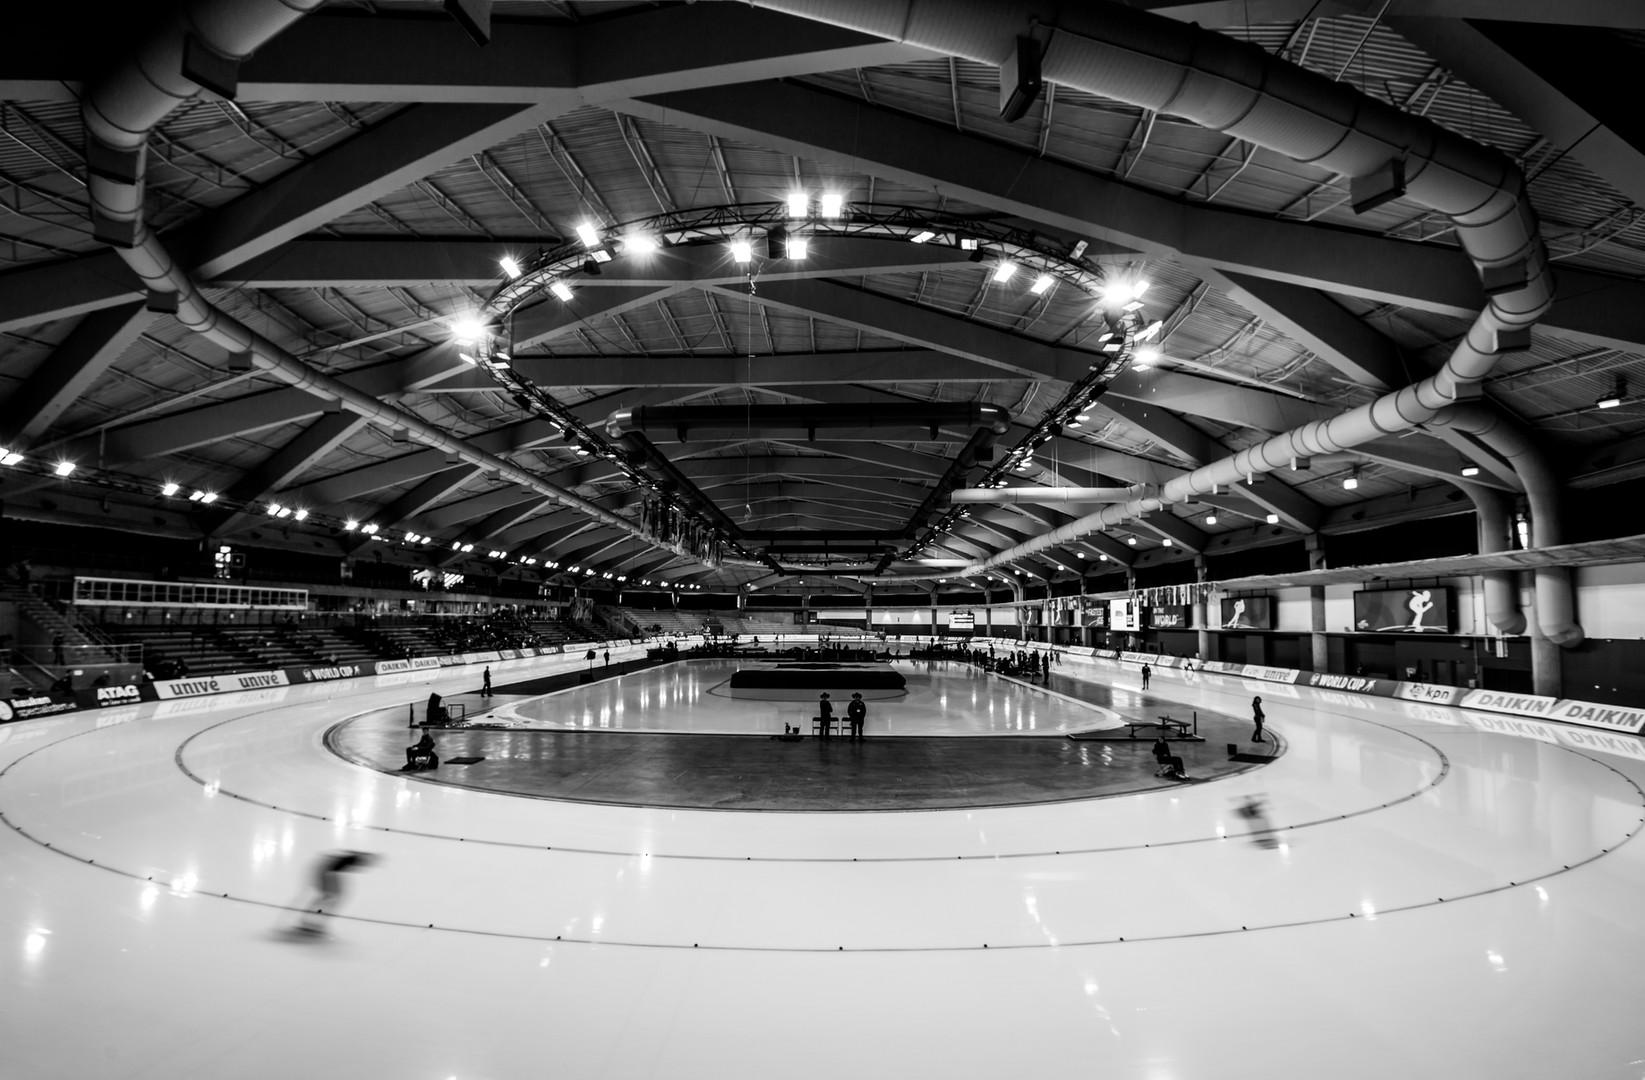 Speed Skating 2020 World Cup Calgary - K